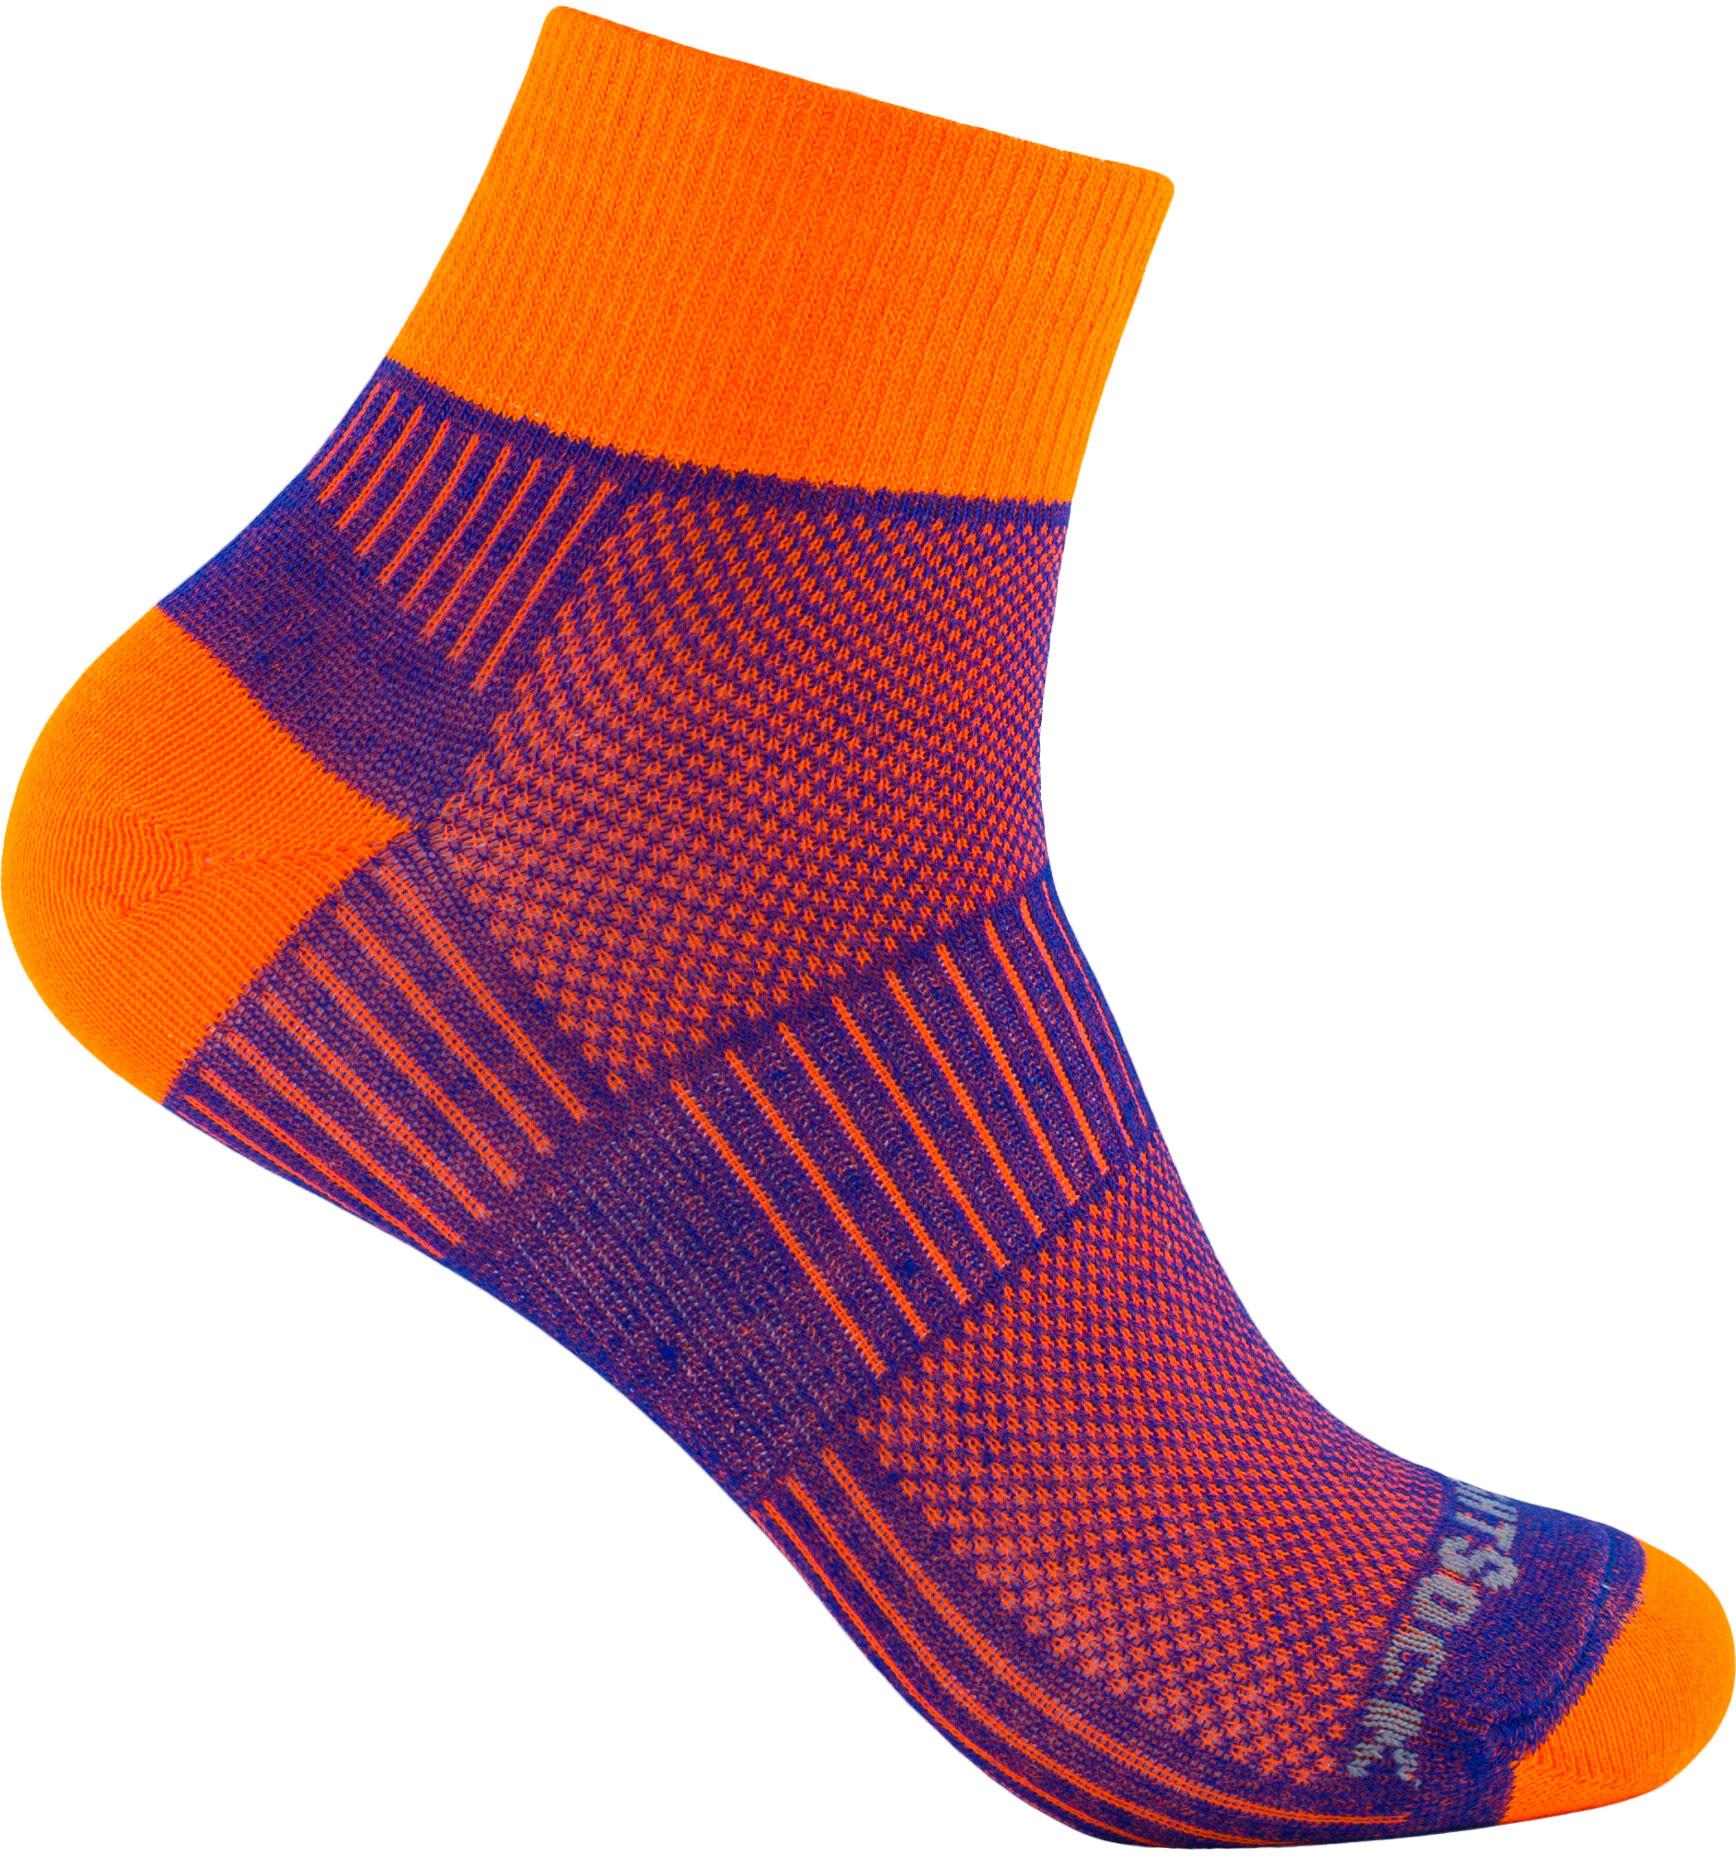 wrightsock coolmesh ii quarter sokken oranje violet l outdoor winkelwrightsock coolmesh ii quarter sokken oranje violet